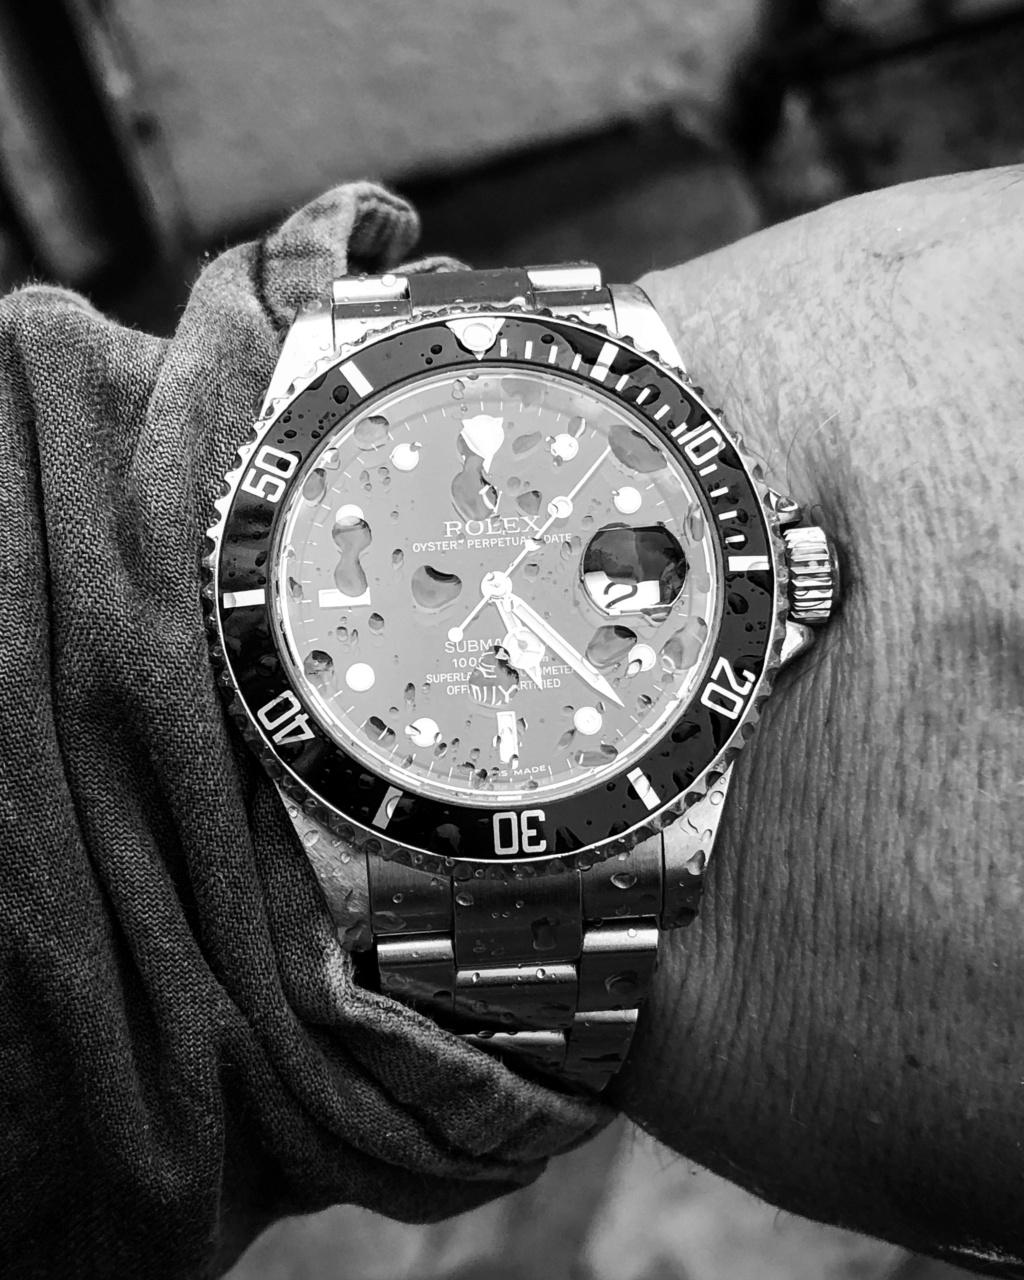 orient - La montre du vendredi, le TGIF watch! - Page 4 E7cbb310